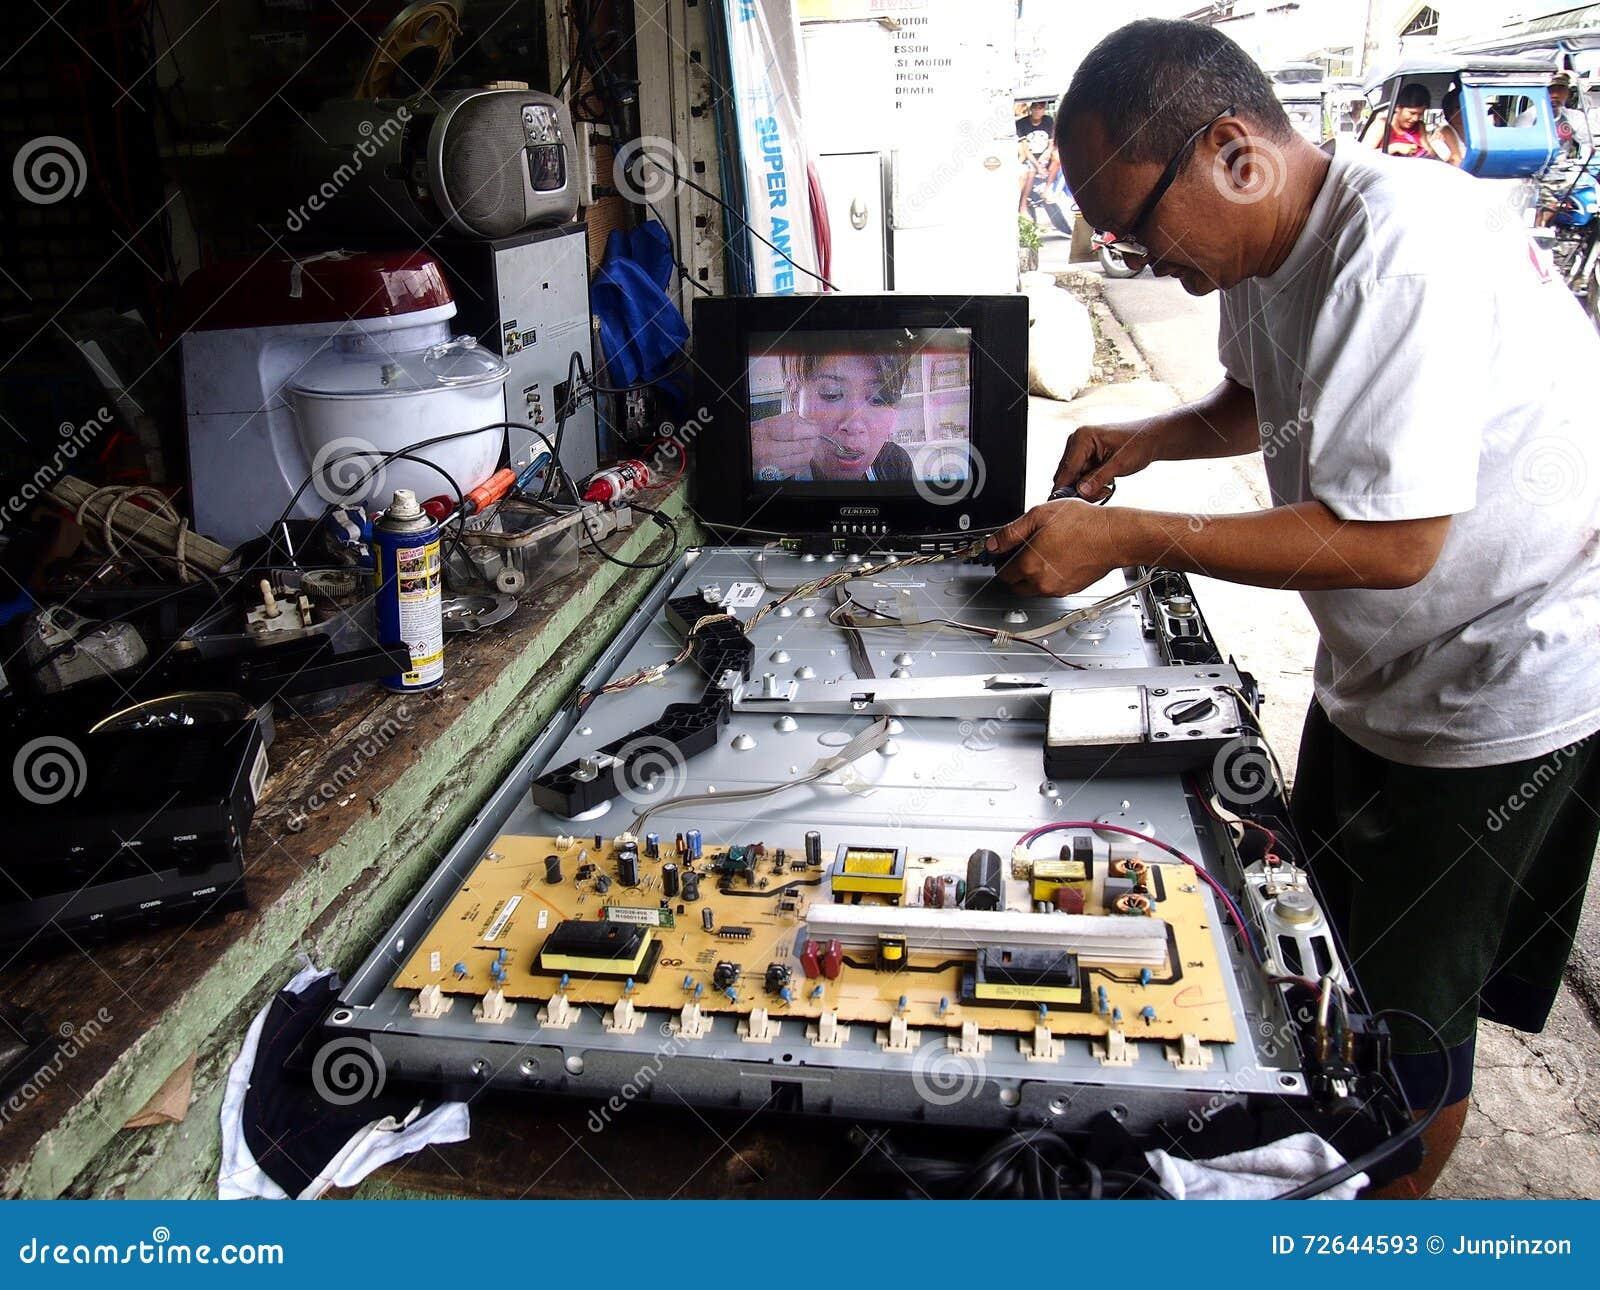 An Electronics Repair Shop Technician Works On A Flat